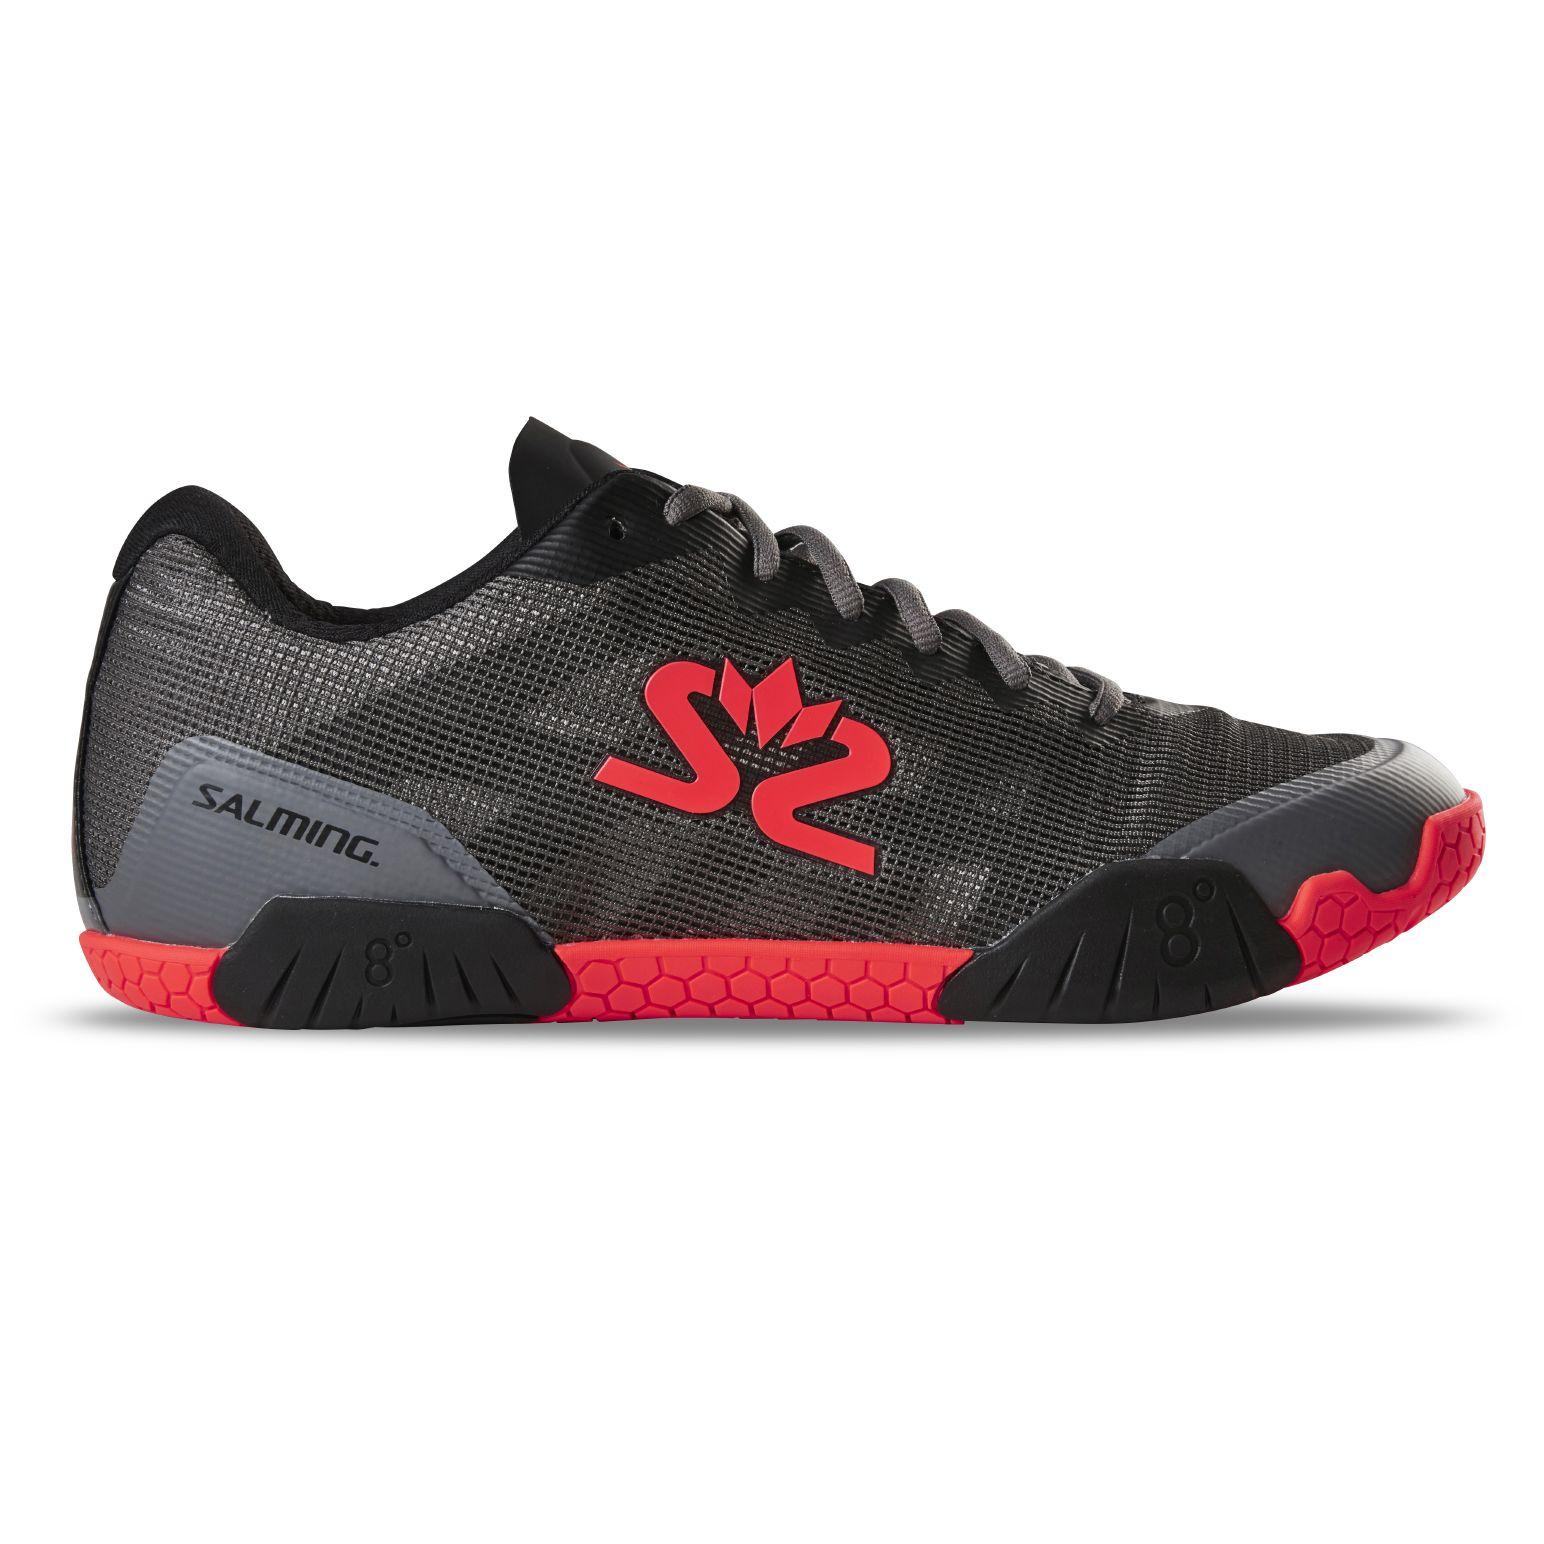 Salming Hawk Shoe Men GunMetal/Red 11,5 UK - 47 1/3 EUR - 30,5 cm